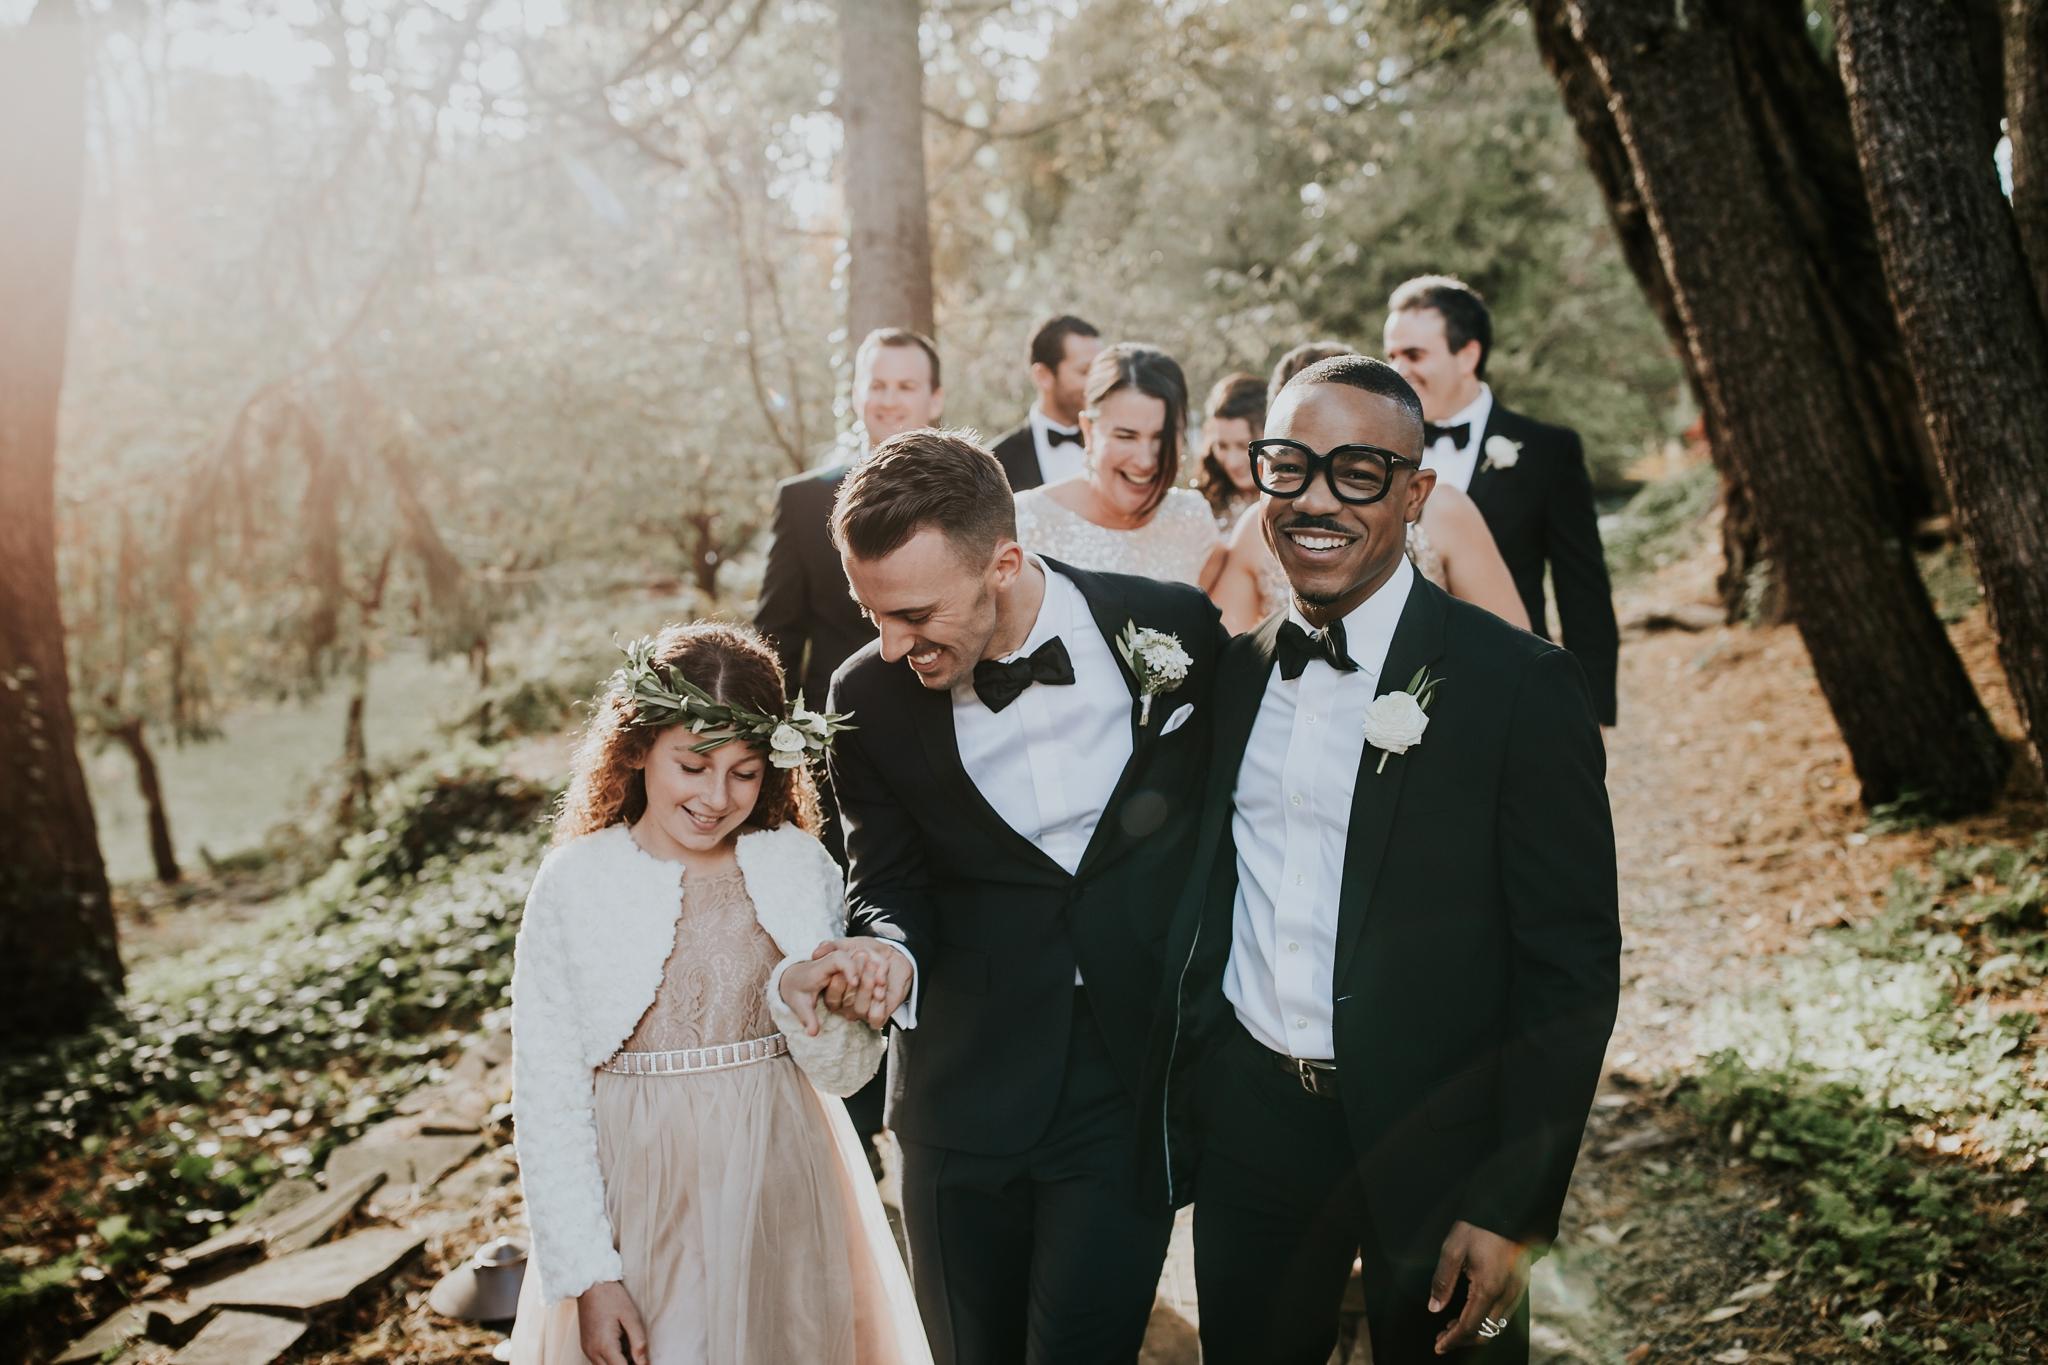 hudson-valley-same-sex-wedding_1261.jpg